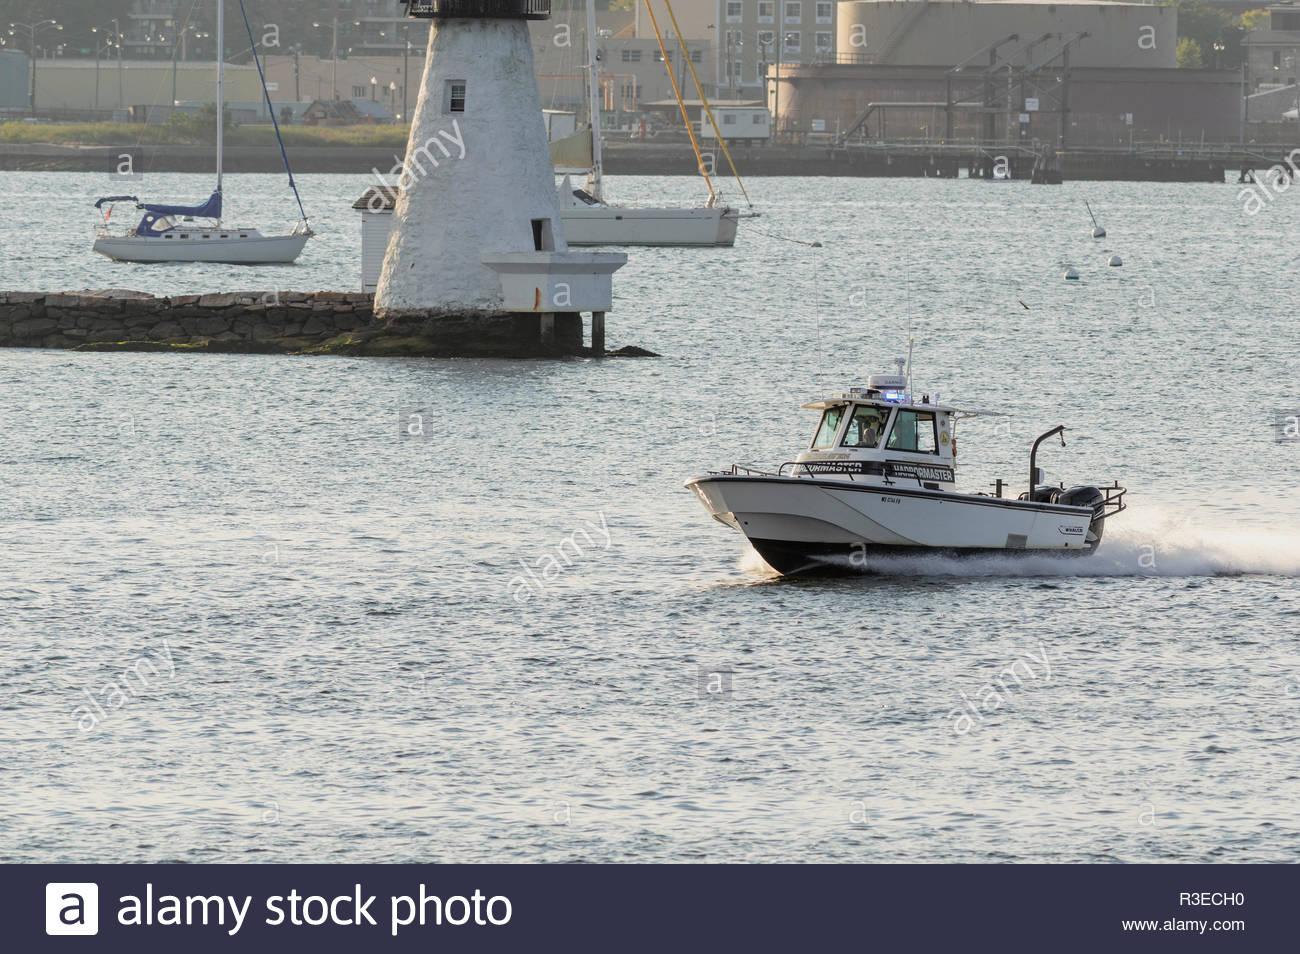 Fairhaven, Massachusetts, USA - August 31, 2018: Fairhaven harbormaster patrol boat hurrying past Palmer Island Light Station on hazy summer evening - Stock Image